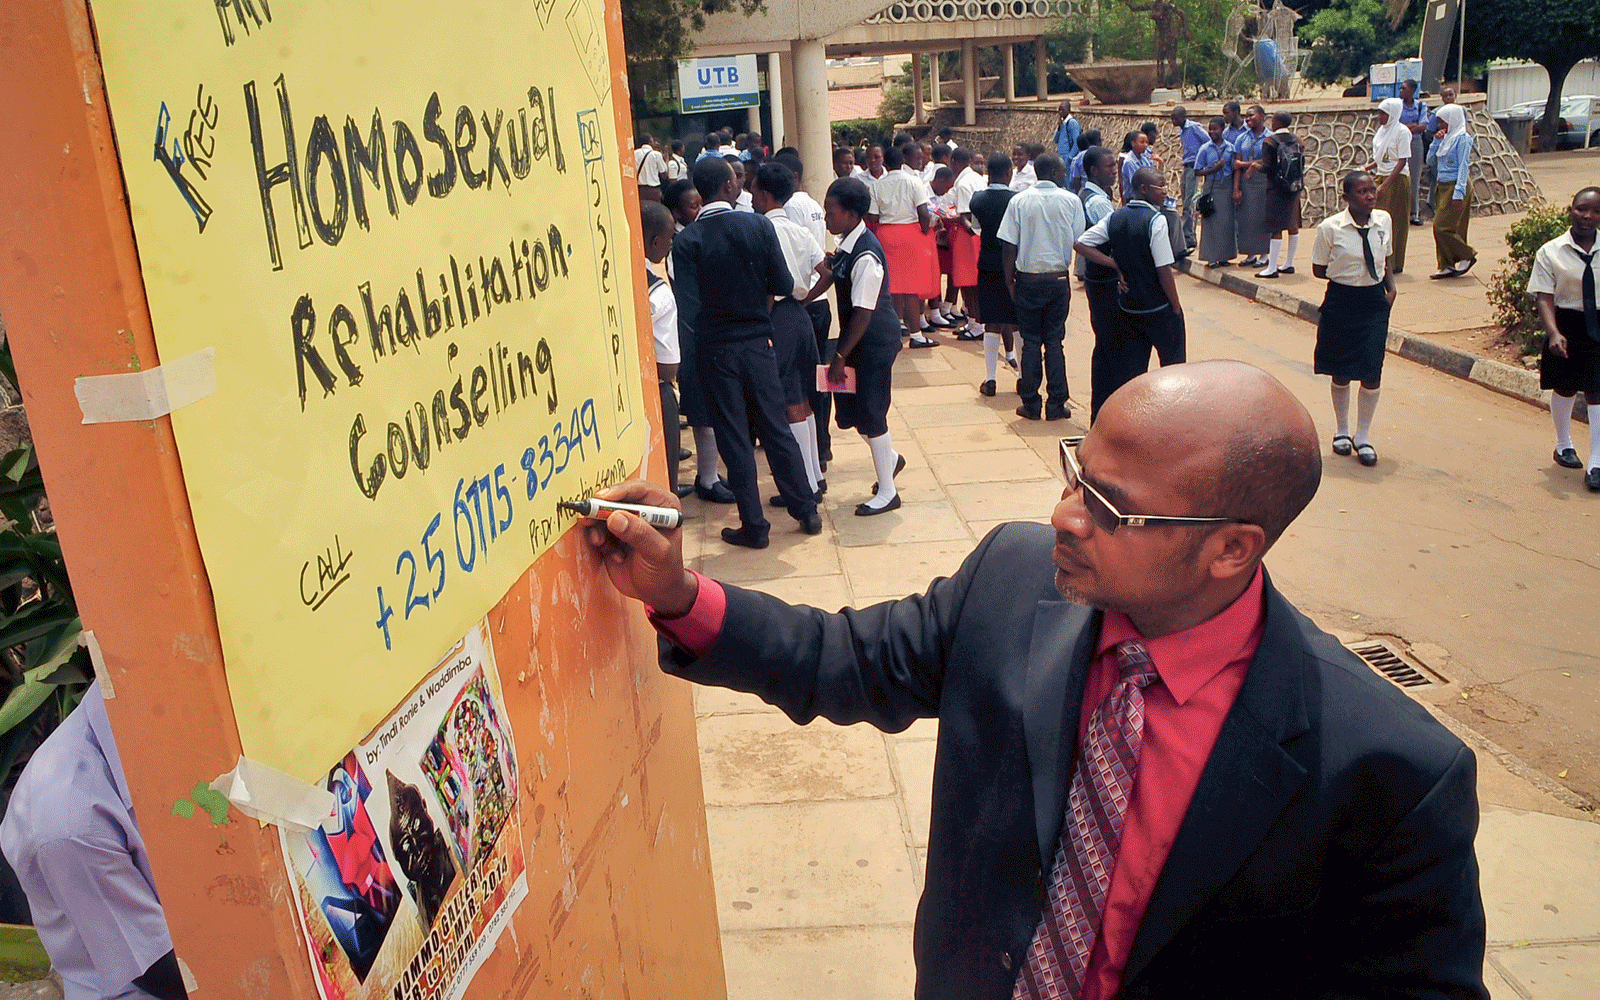 Uganda homosexualitet lag